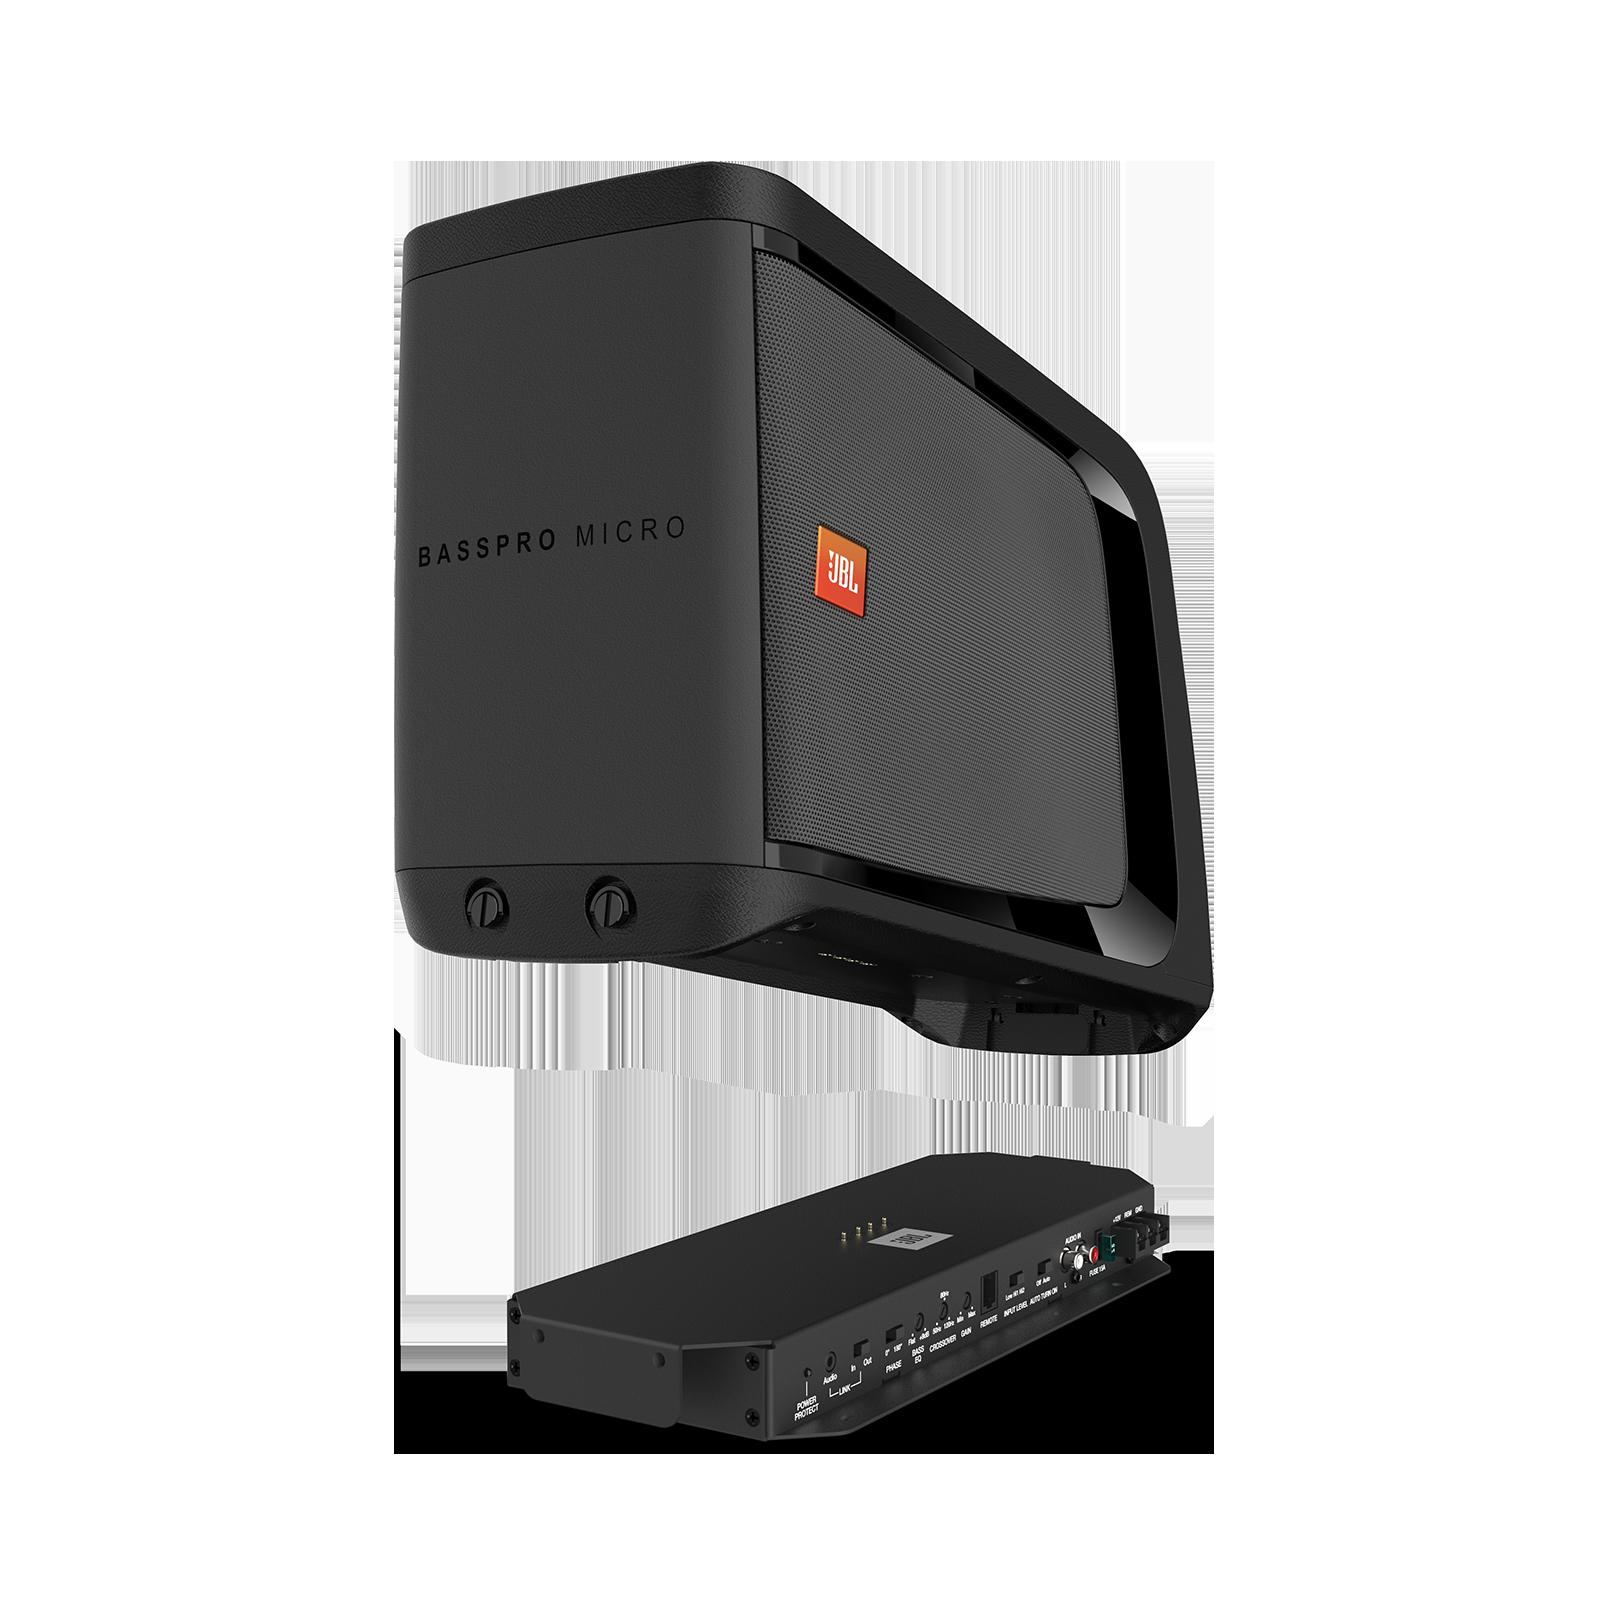 JBL BassPro Micro - Black - JBL BassPro Micro Dockable Powered Subwoofer System - Hero